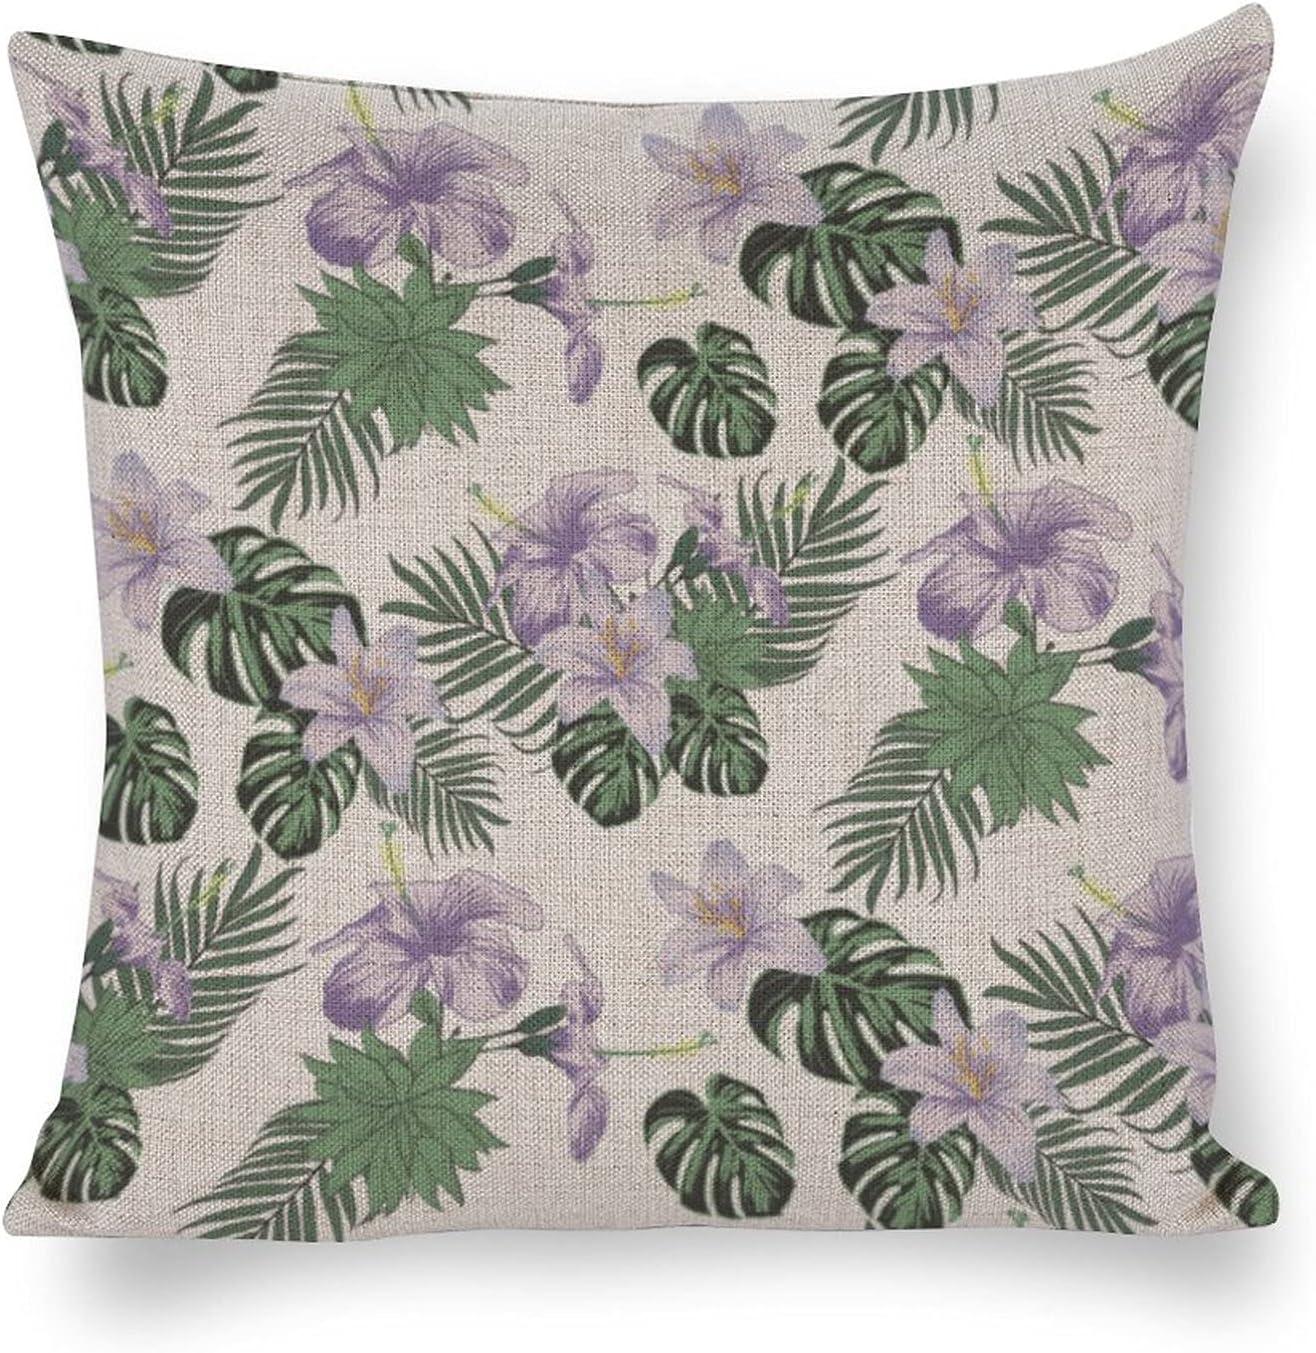 UTF4C Flower Plant Leaf lowest price Terrestrial Sofa Max 59% OFF Cotton Linen Cush